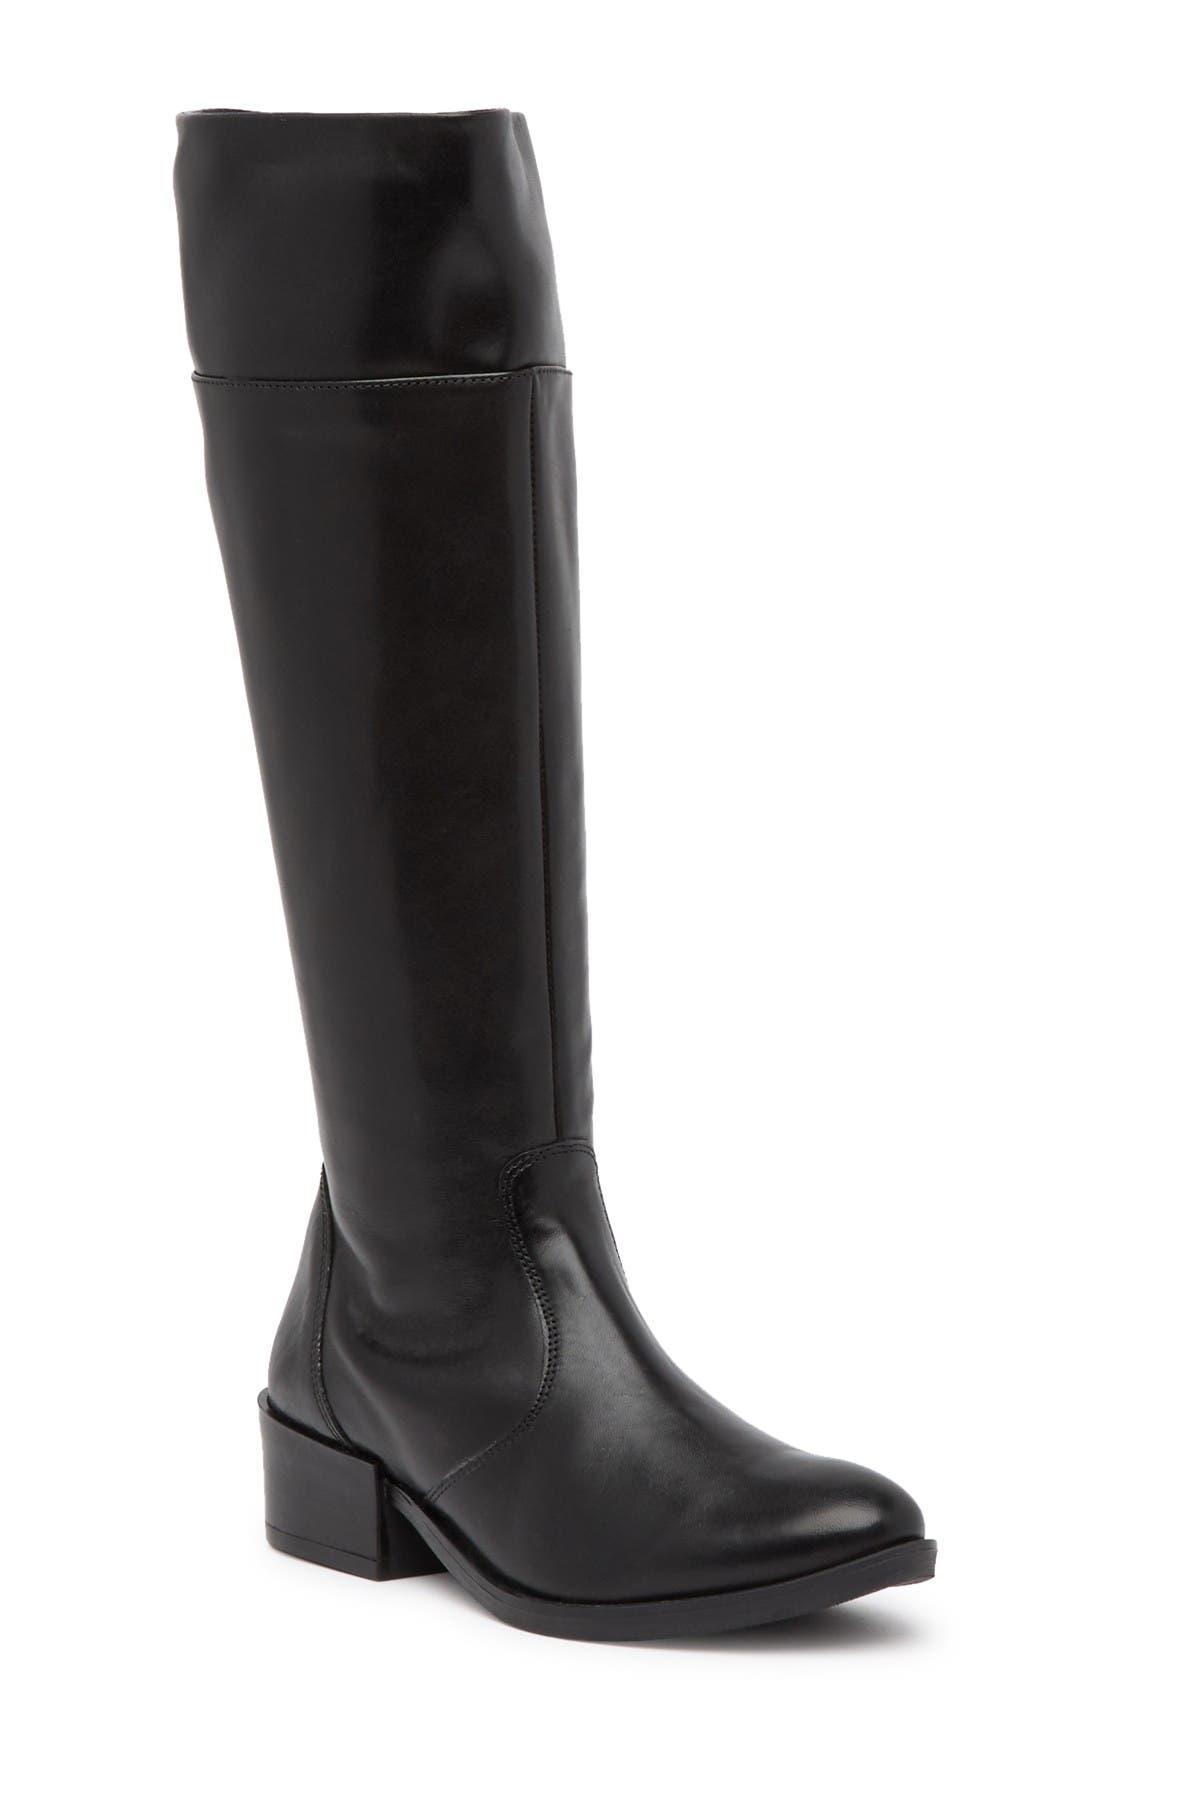 Image of Italian Shoemakers Ada Leather Knee-High Boot